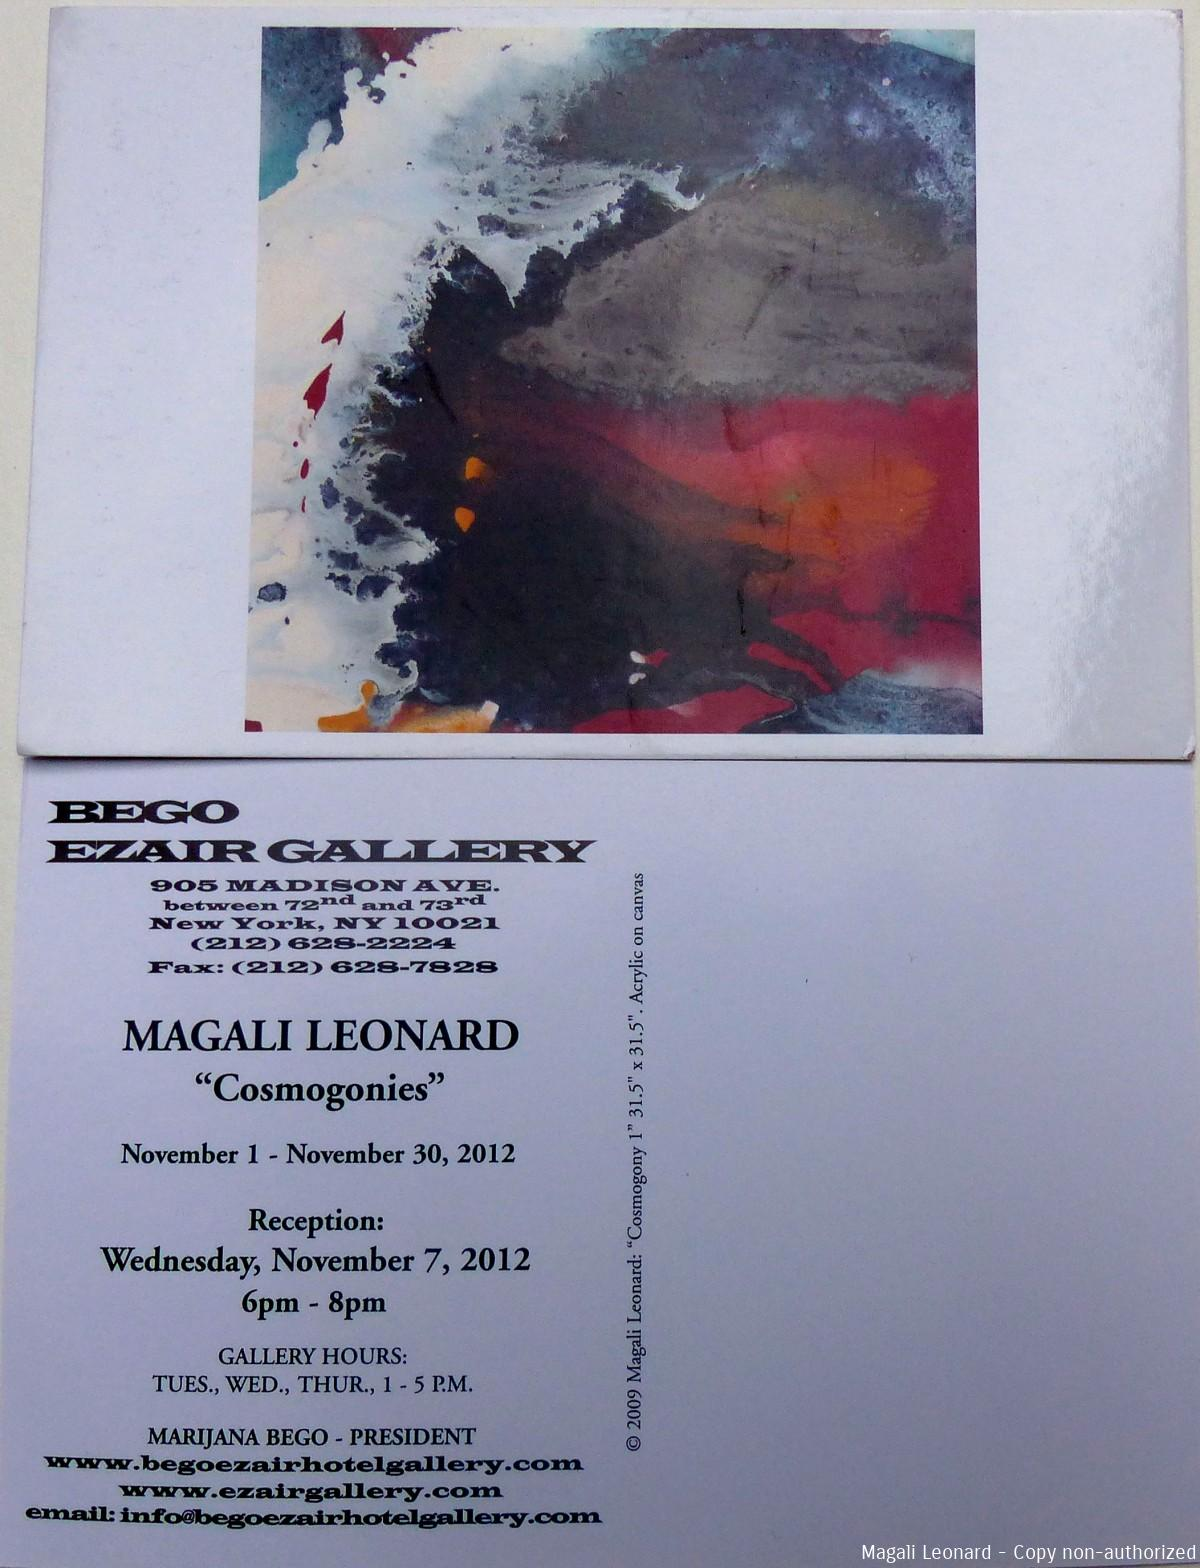 carte invitationgalerie Ezair Bego New York 2012